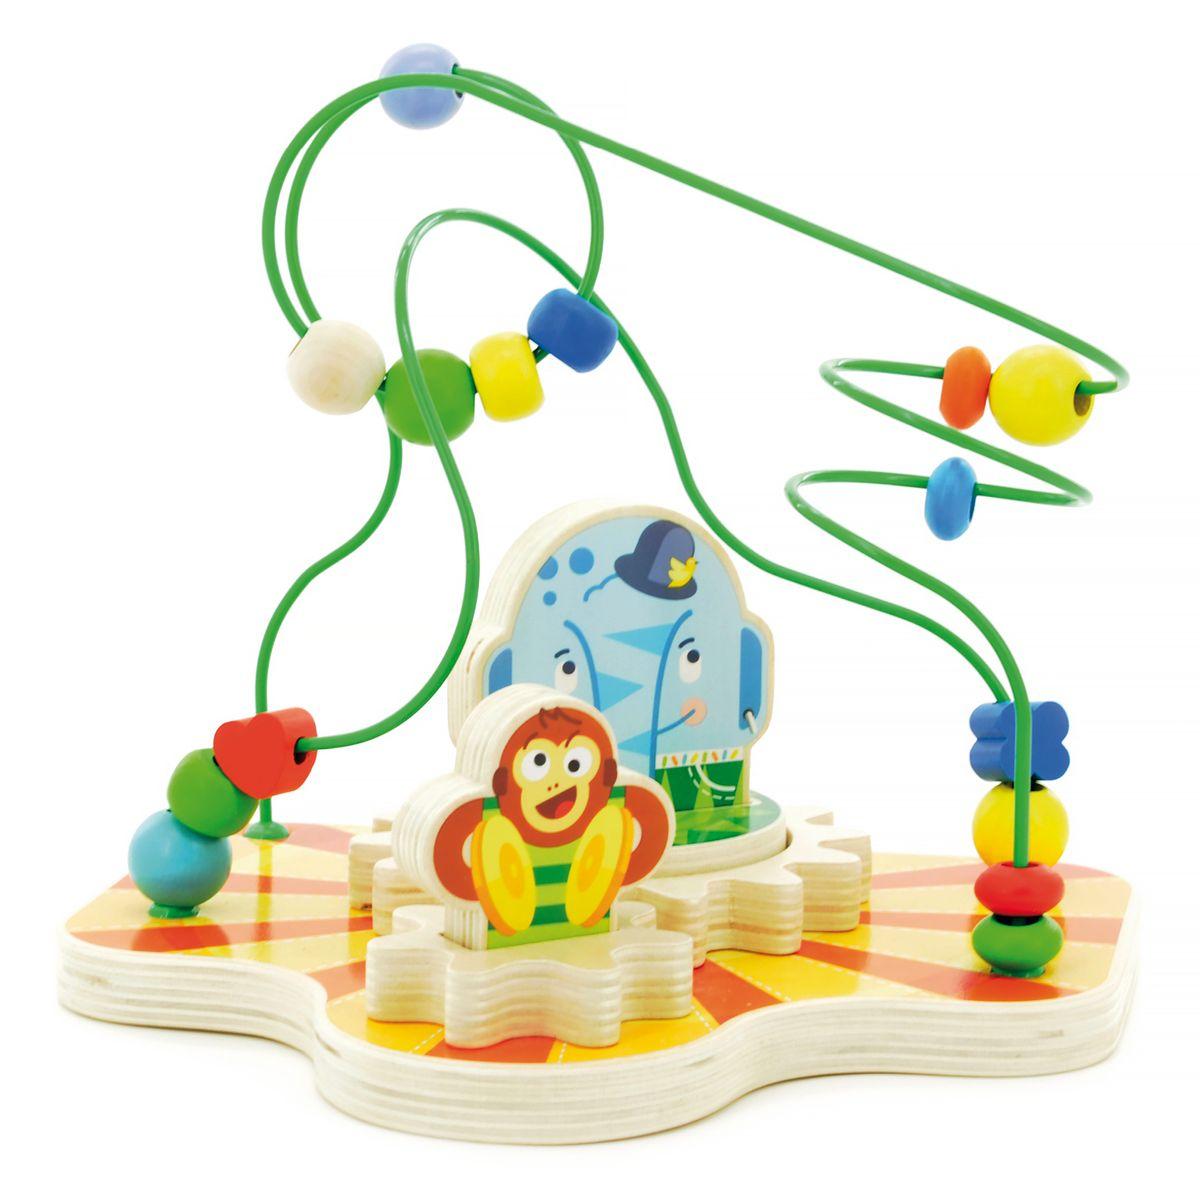 Мир деревянных игрушек Сортер-лабиринт Цирк игрушка мир деревянных игрушек лабиринт буренка д384